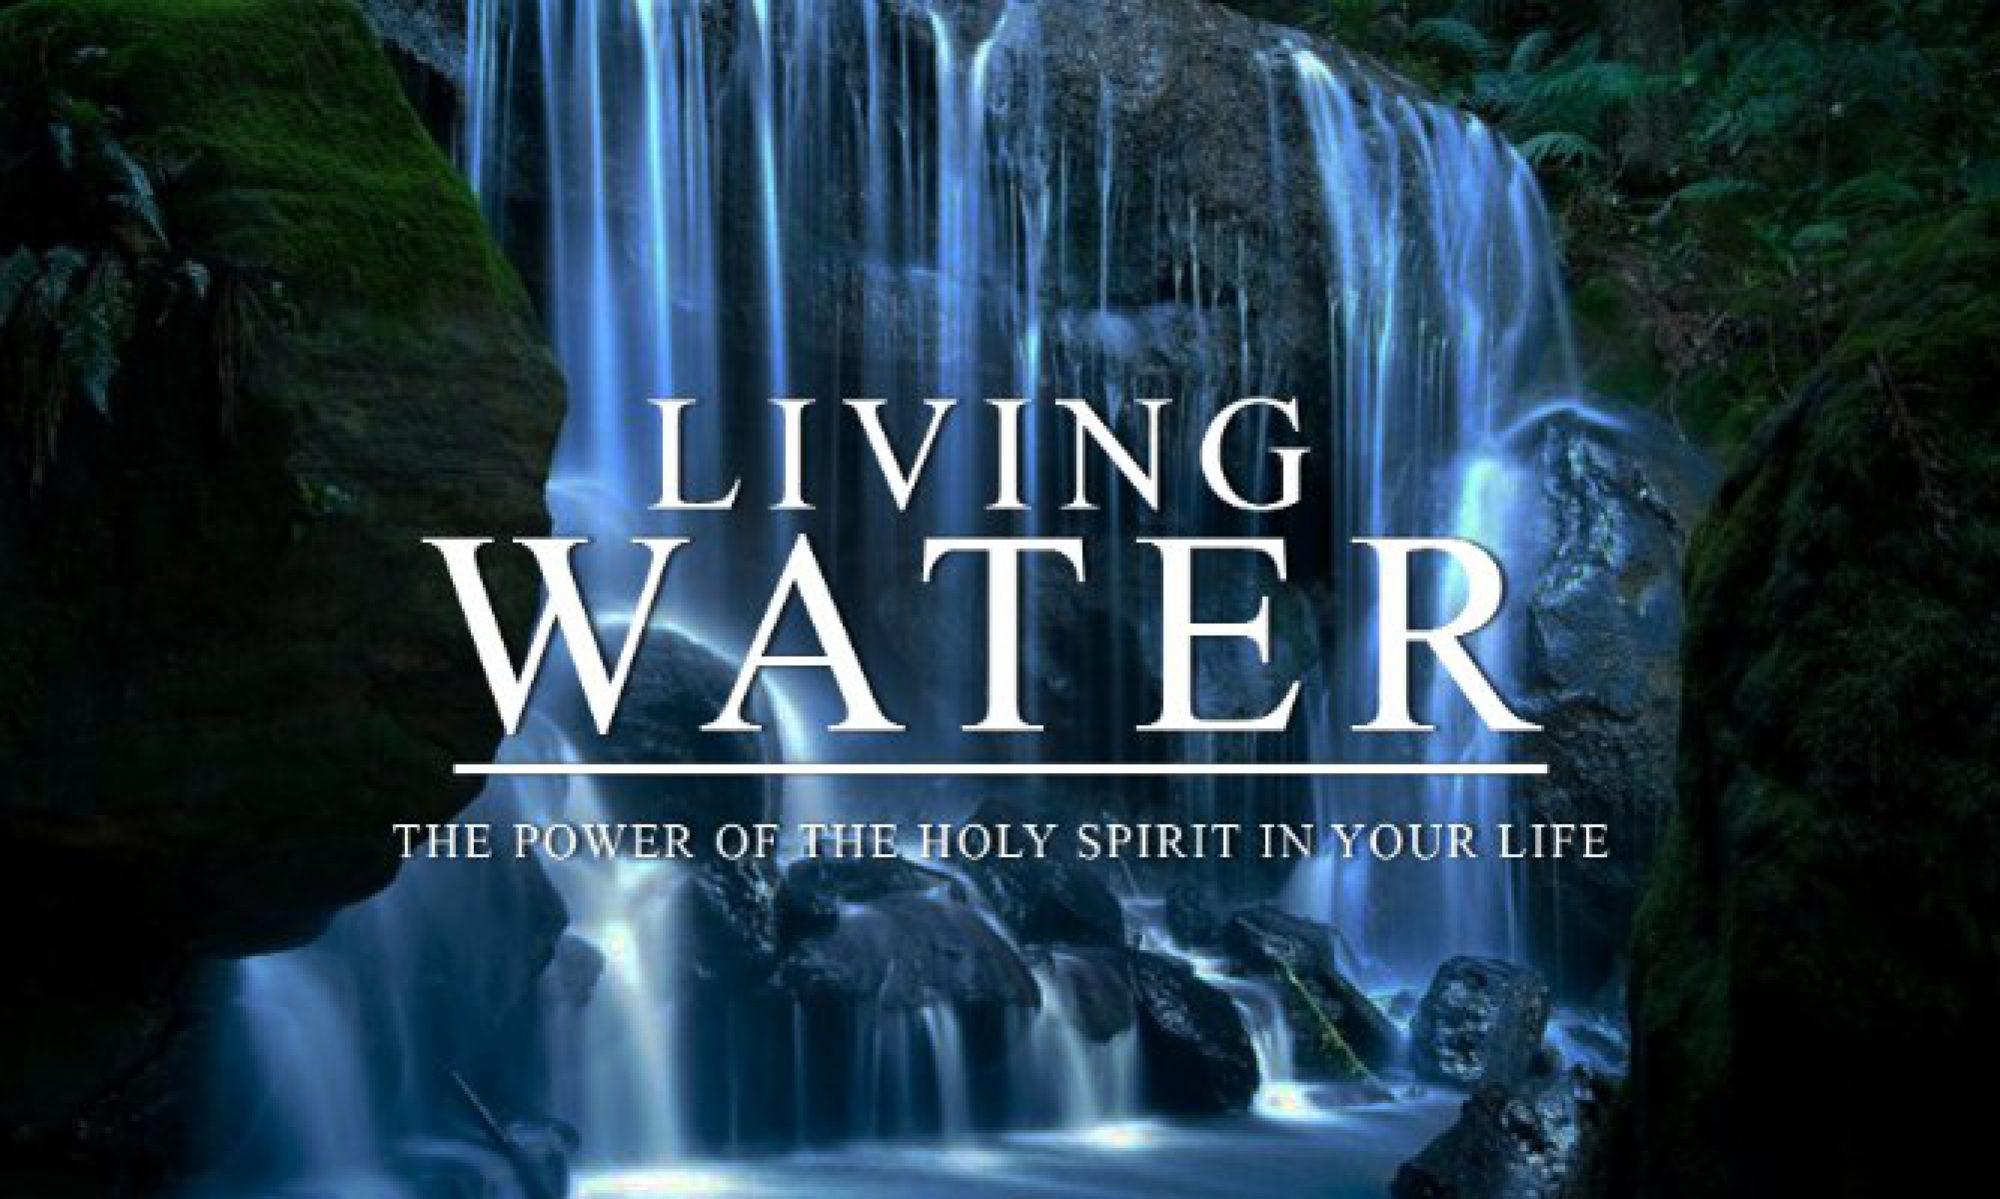 My Living Water Devotional